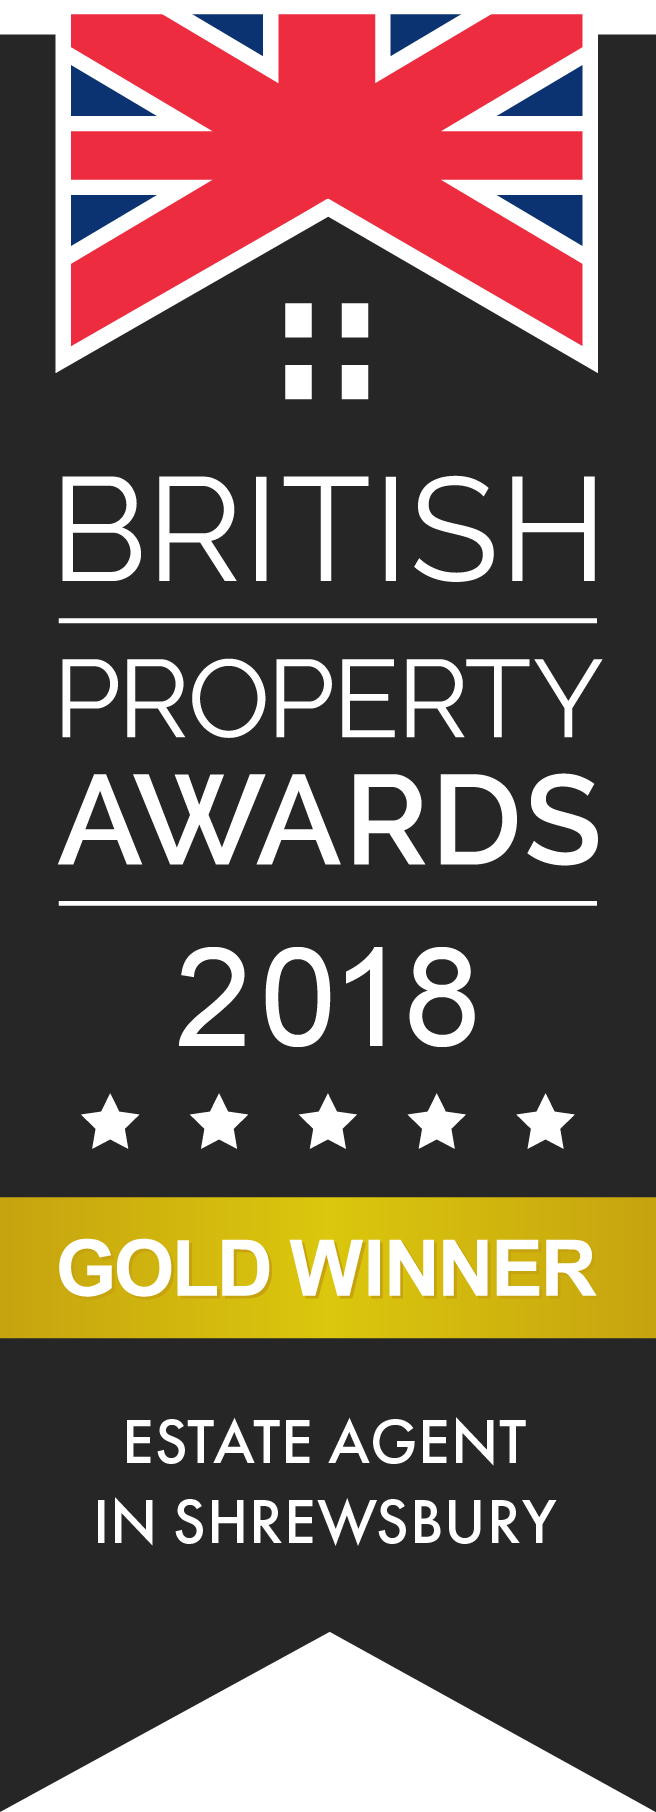 British Property Awards Winner 2018